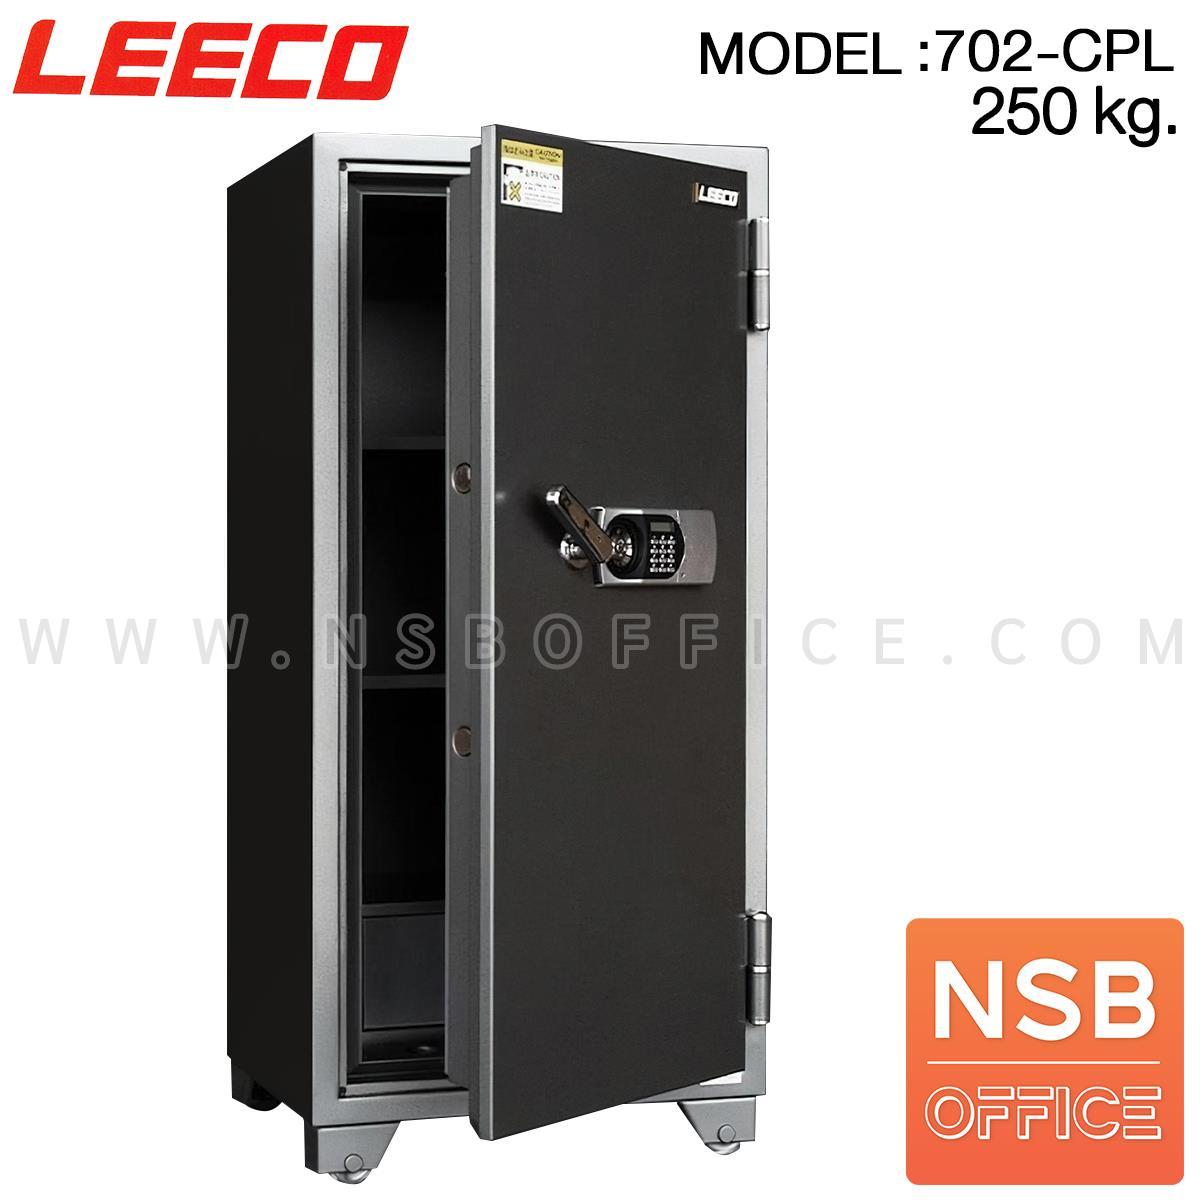 F02A064:ตู้เซฟดิจิตอล 250 กก. รุ่น 702-CPL   1 กุญแจ 1 รหัส